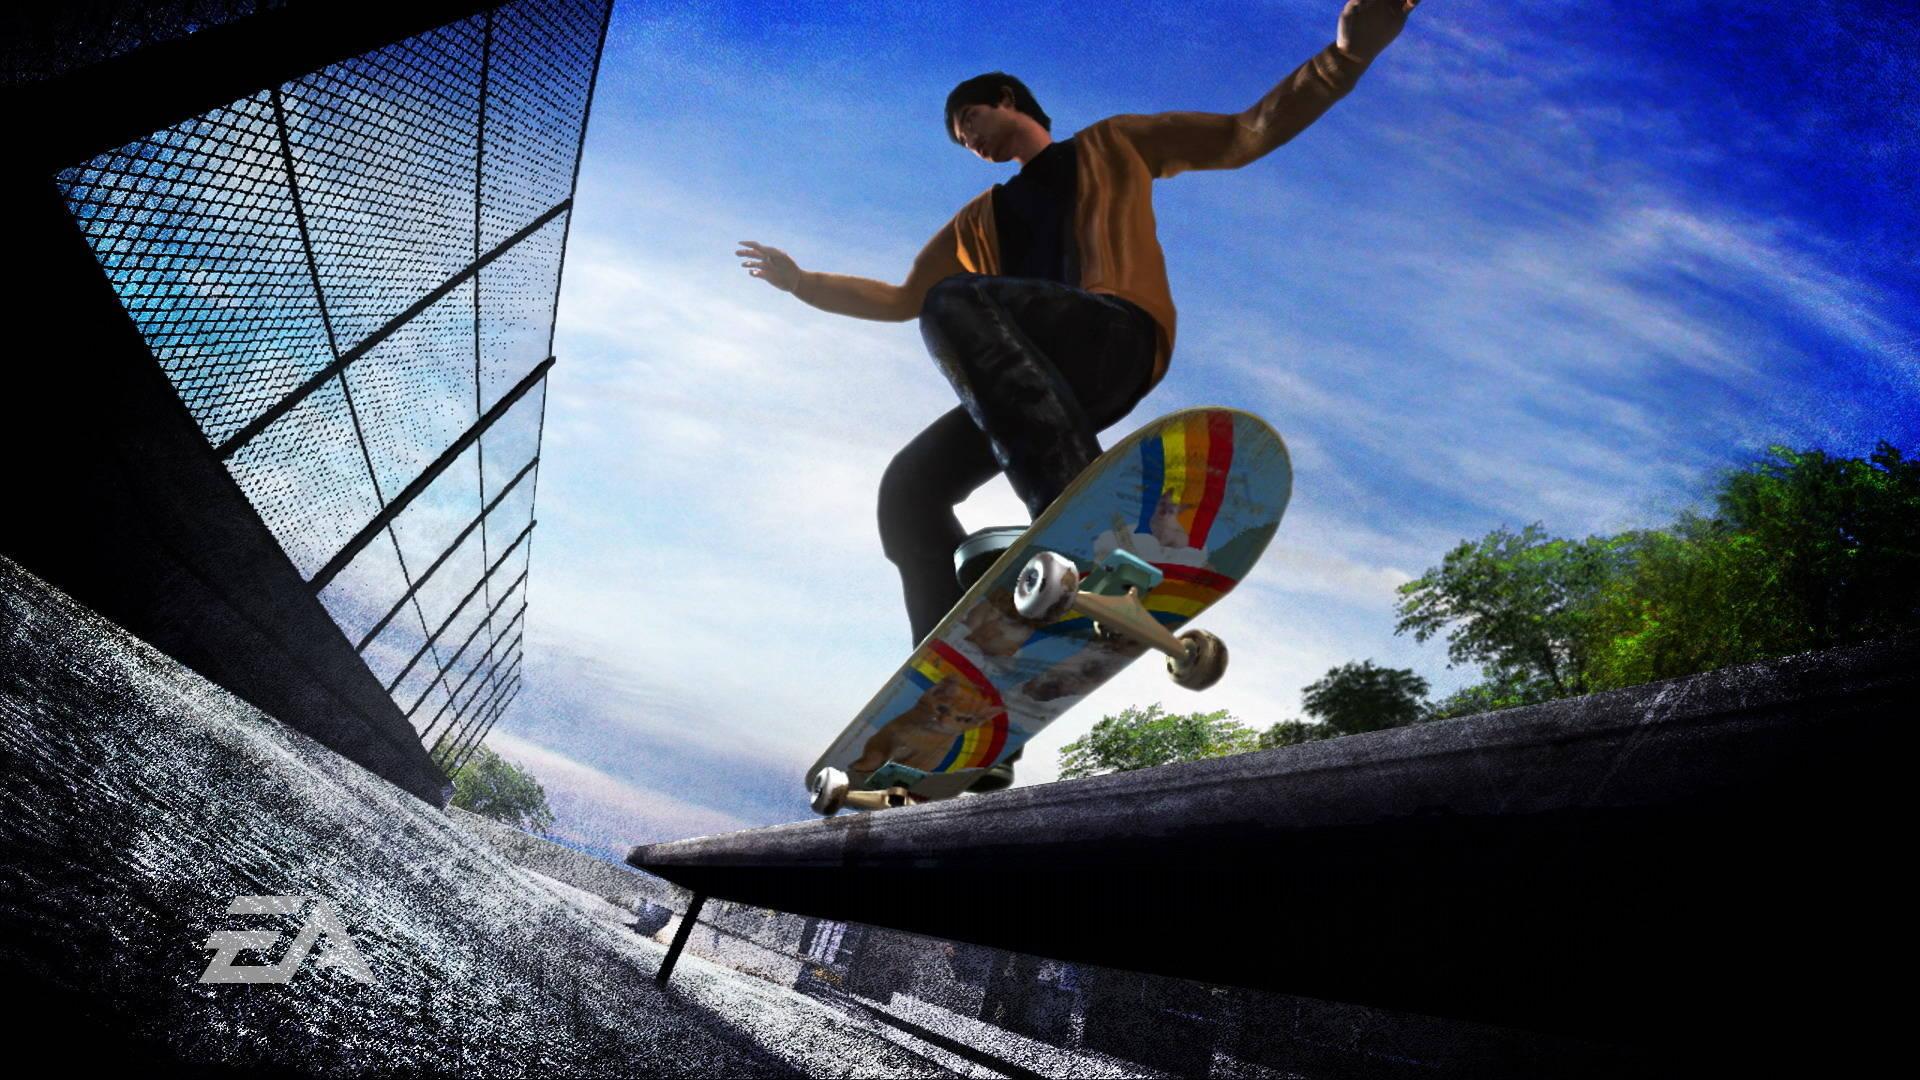 Skateboarding Computer Wallpaper